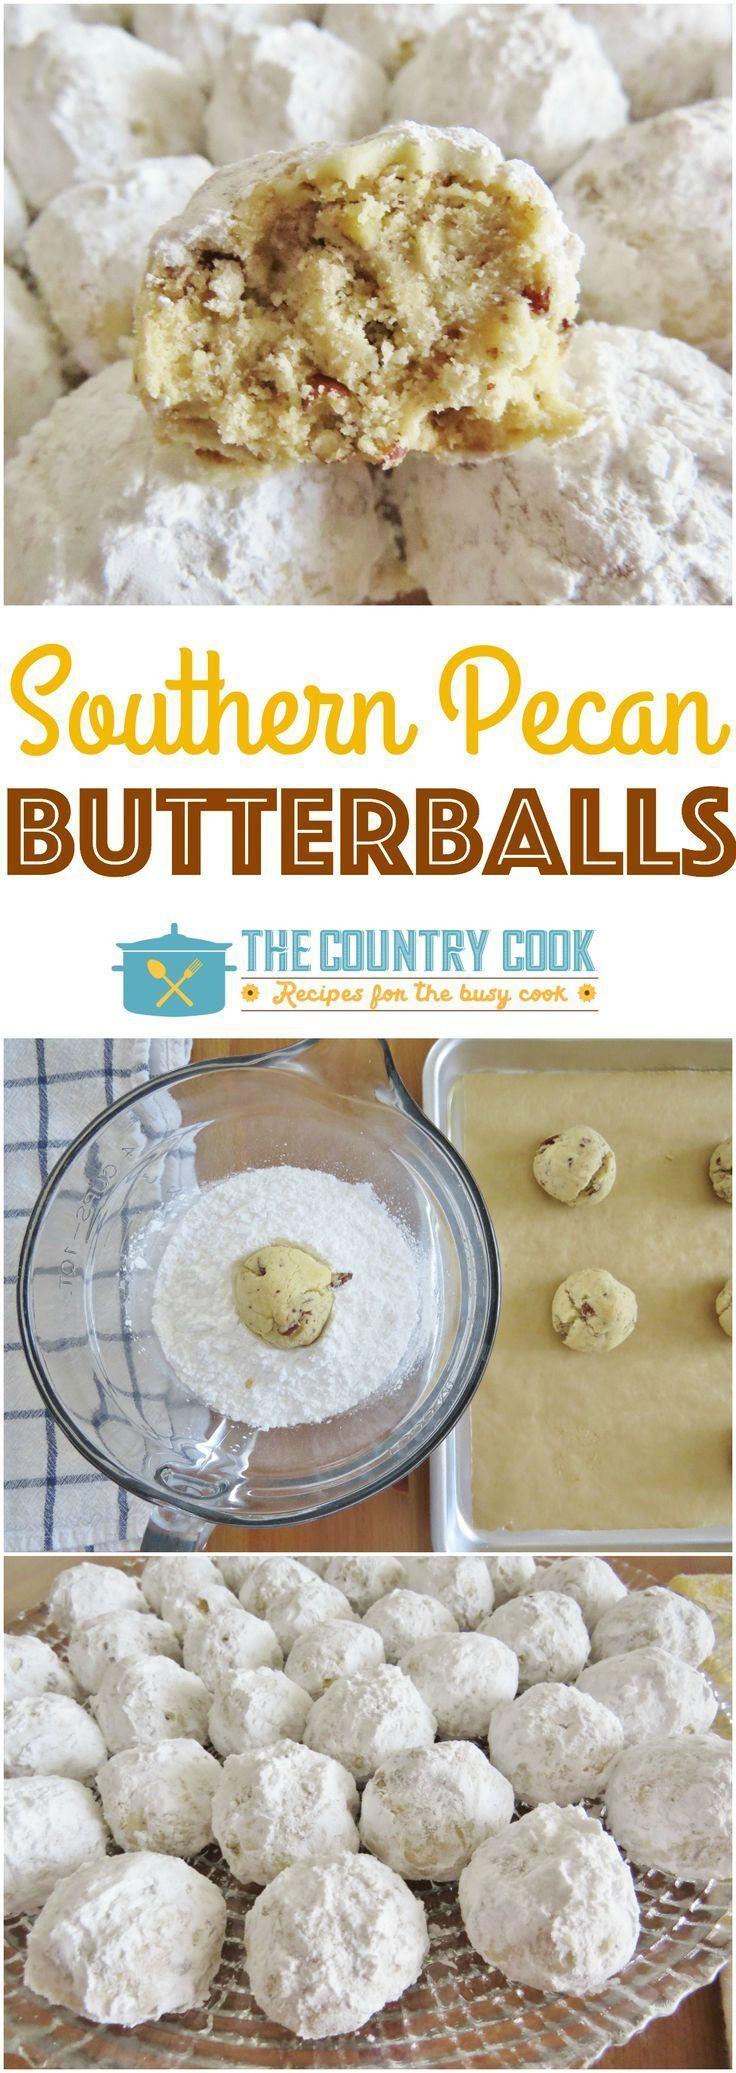 Southern Pecan Butterballs Recipe Tea cakes, Food